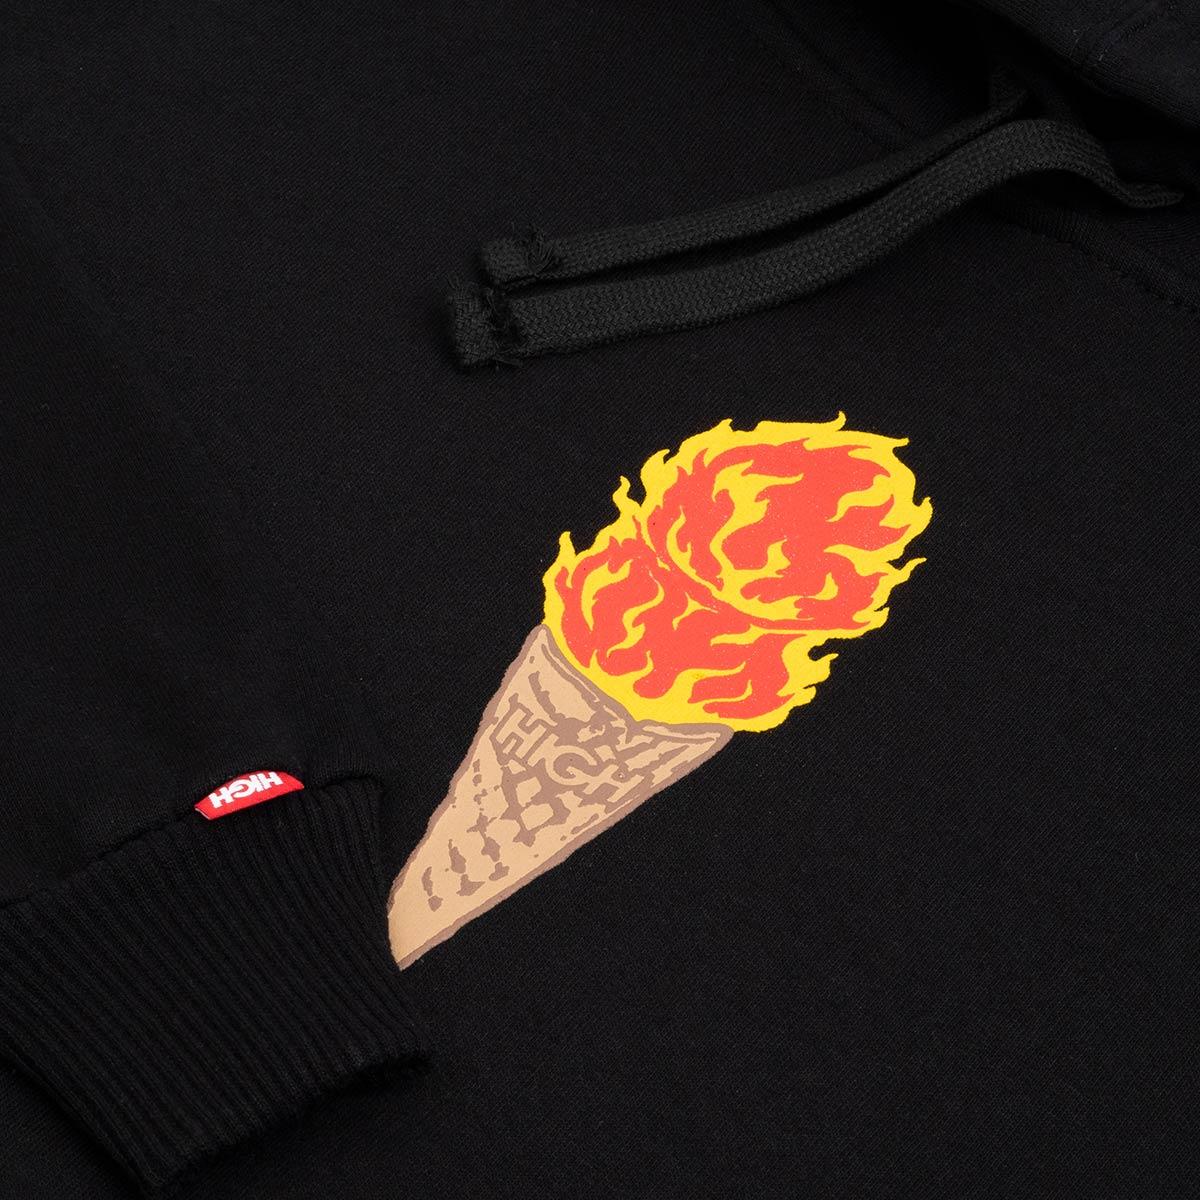 Moletom High Hoodie Fire Cream Black